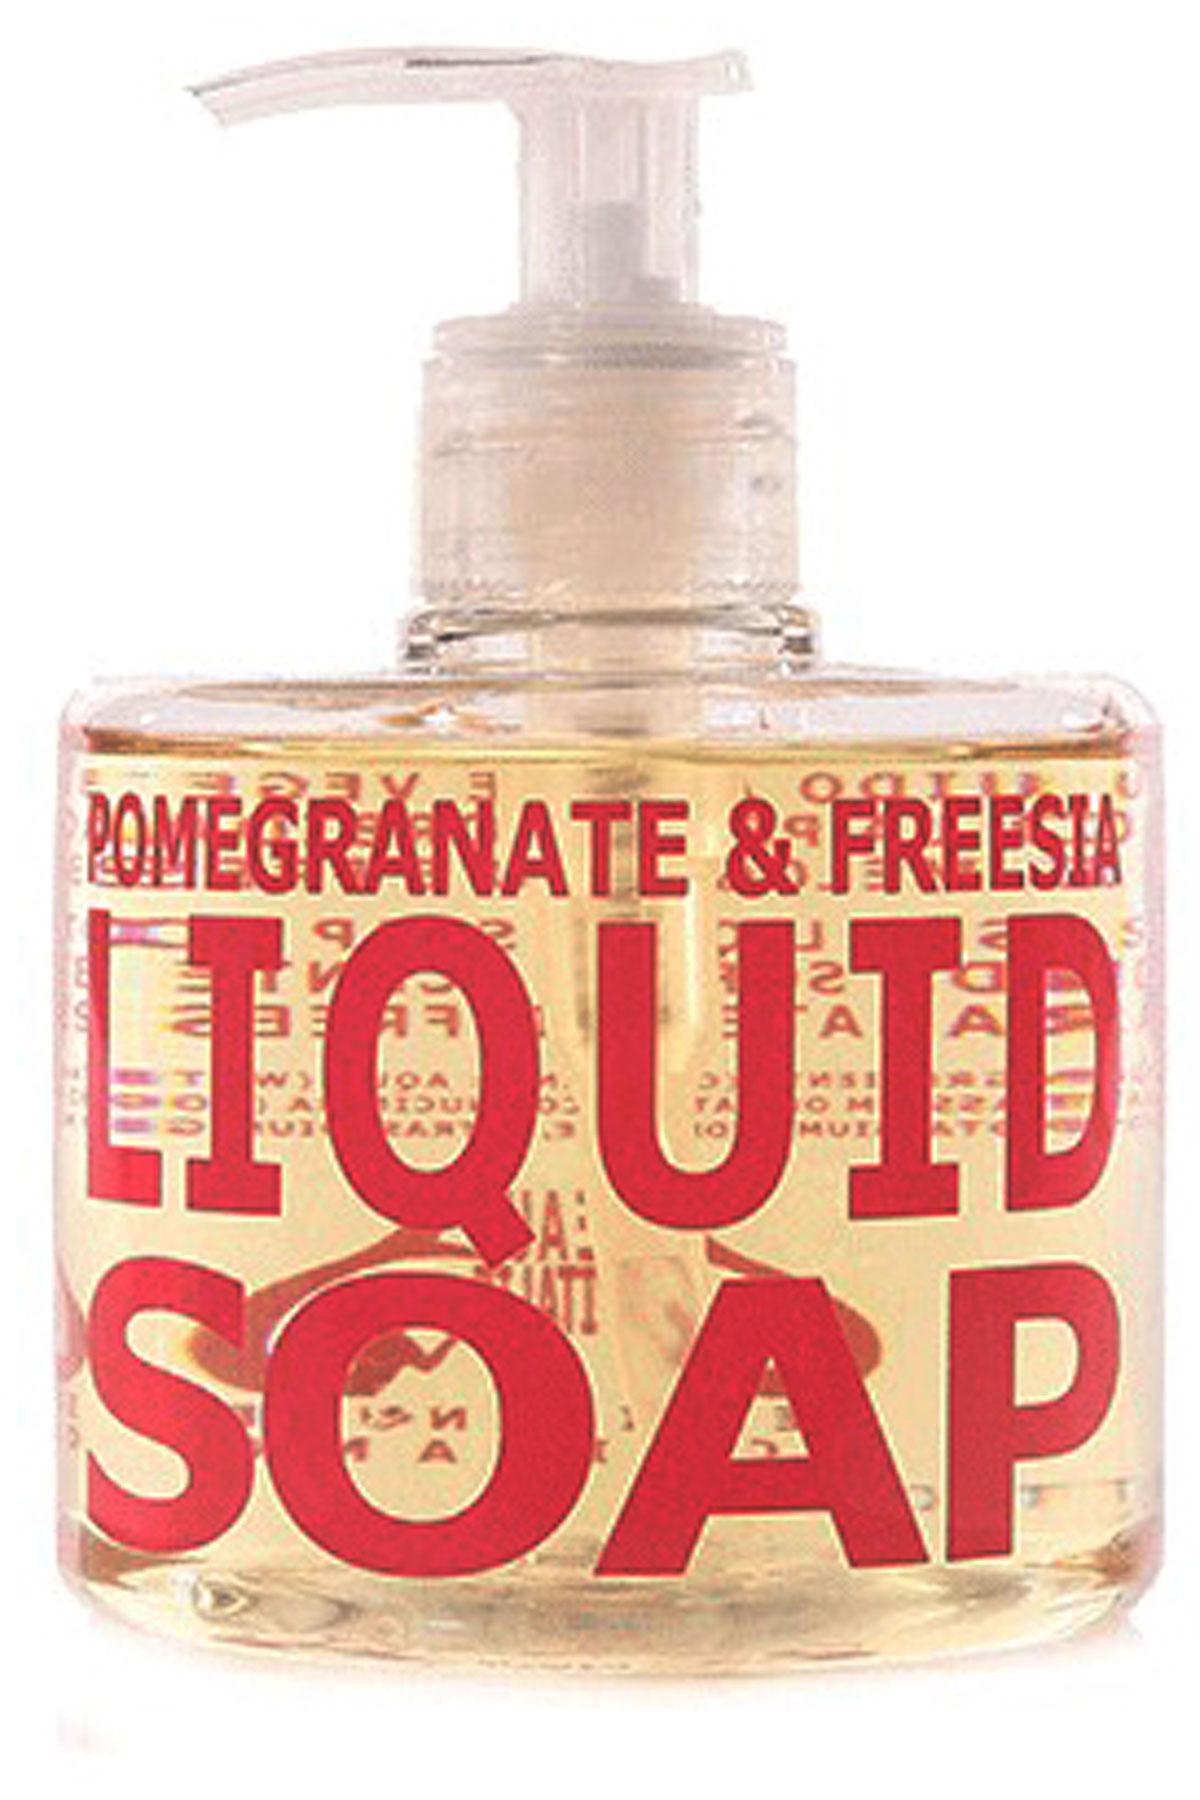 Eau D Italie Beauty for Women, Pomegranate And Freesia - Liquid Soap - 300 Ml, 2019, 300 ml